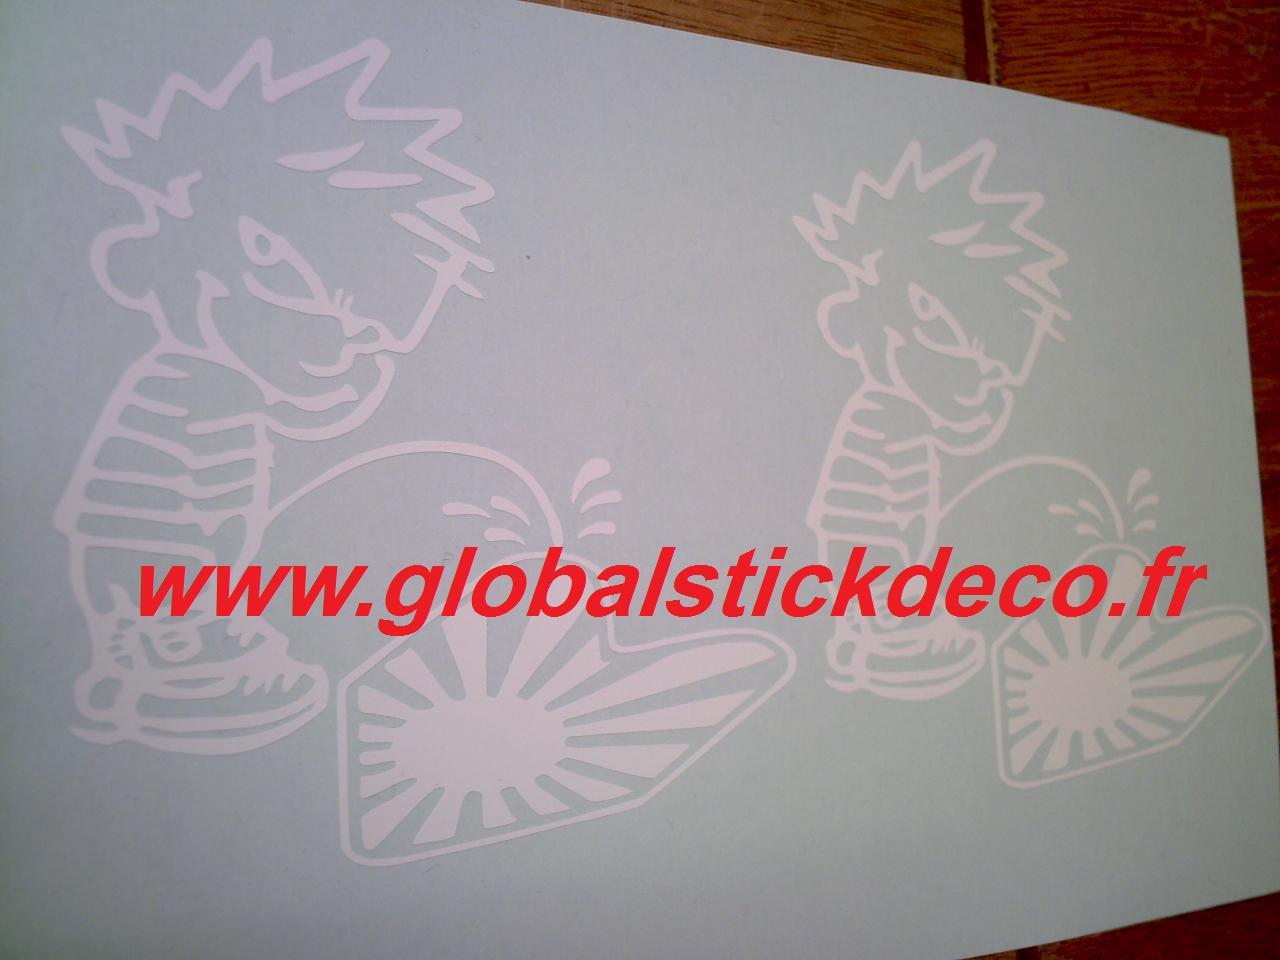 Stickers fin octobre 303